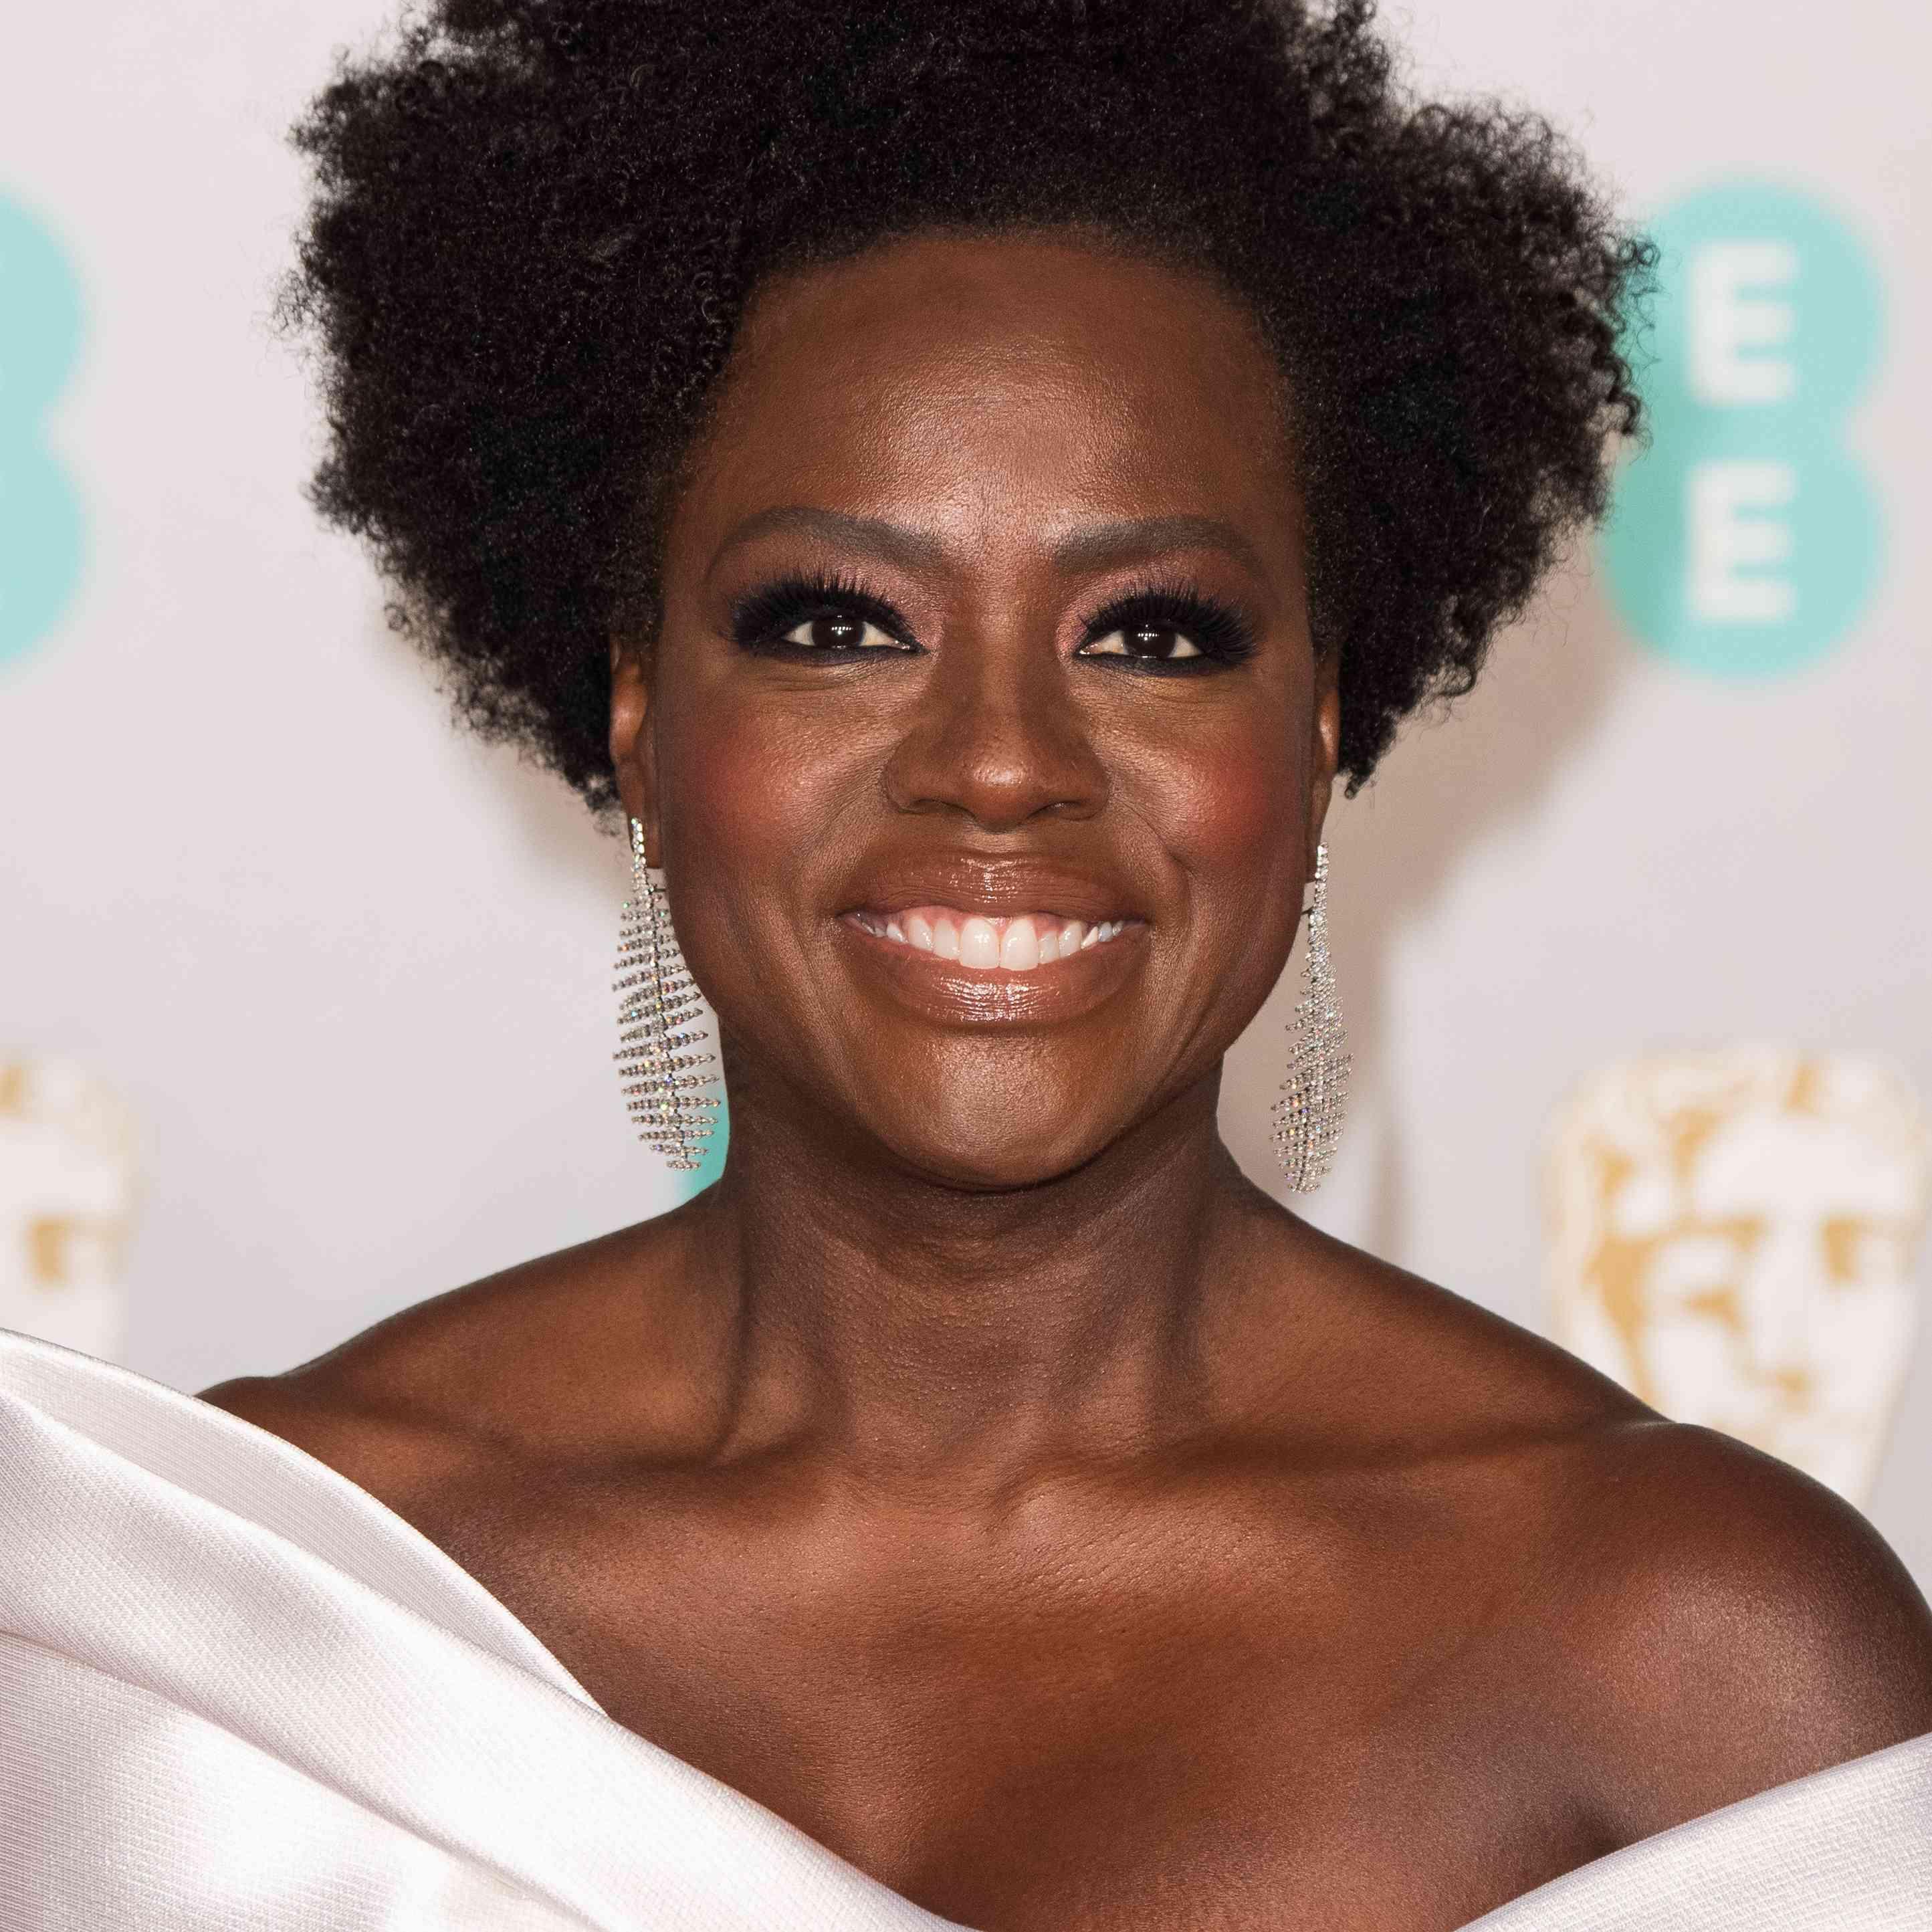 Viola Davis EE British Academy Film Awards - Red Carpet Arrivals